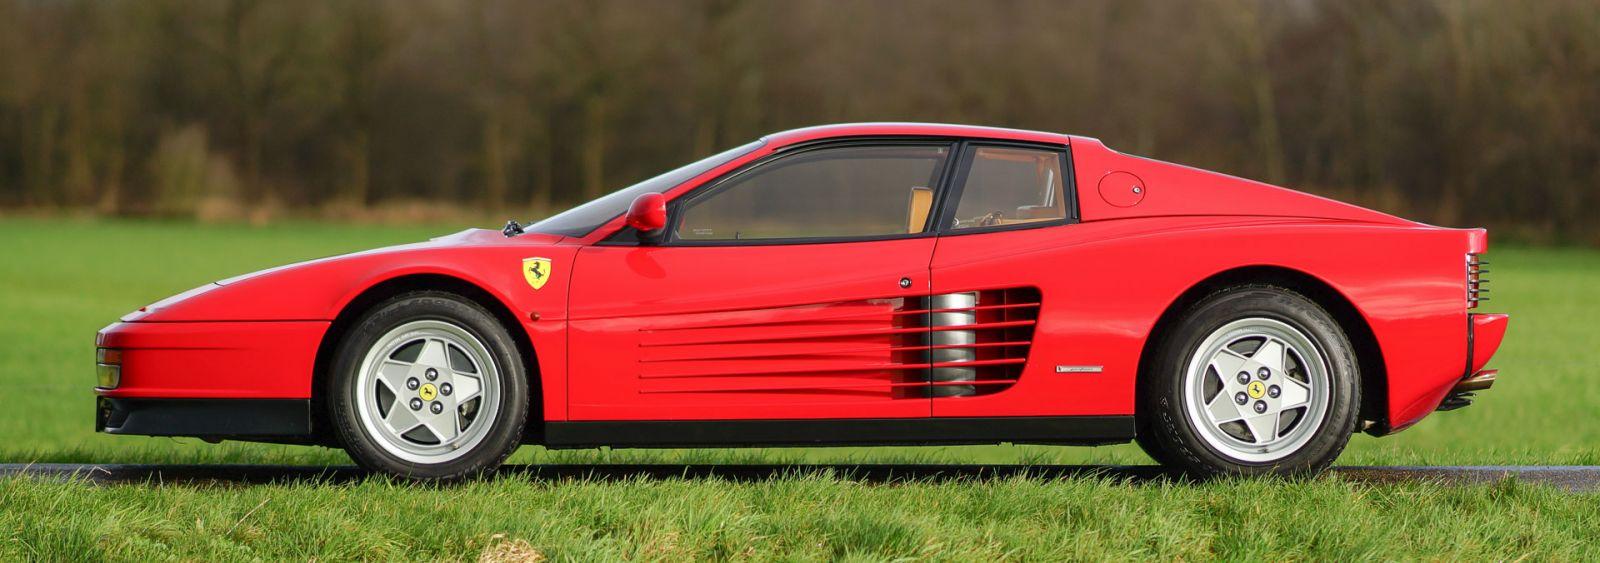 Ferrari testarossa 1991 welcome to classicargarage vanachro Images